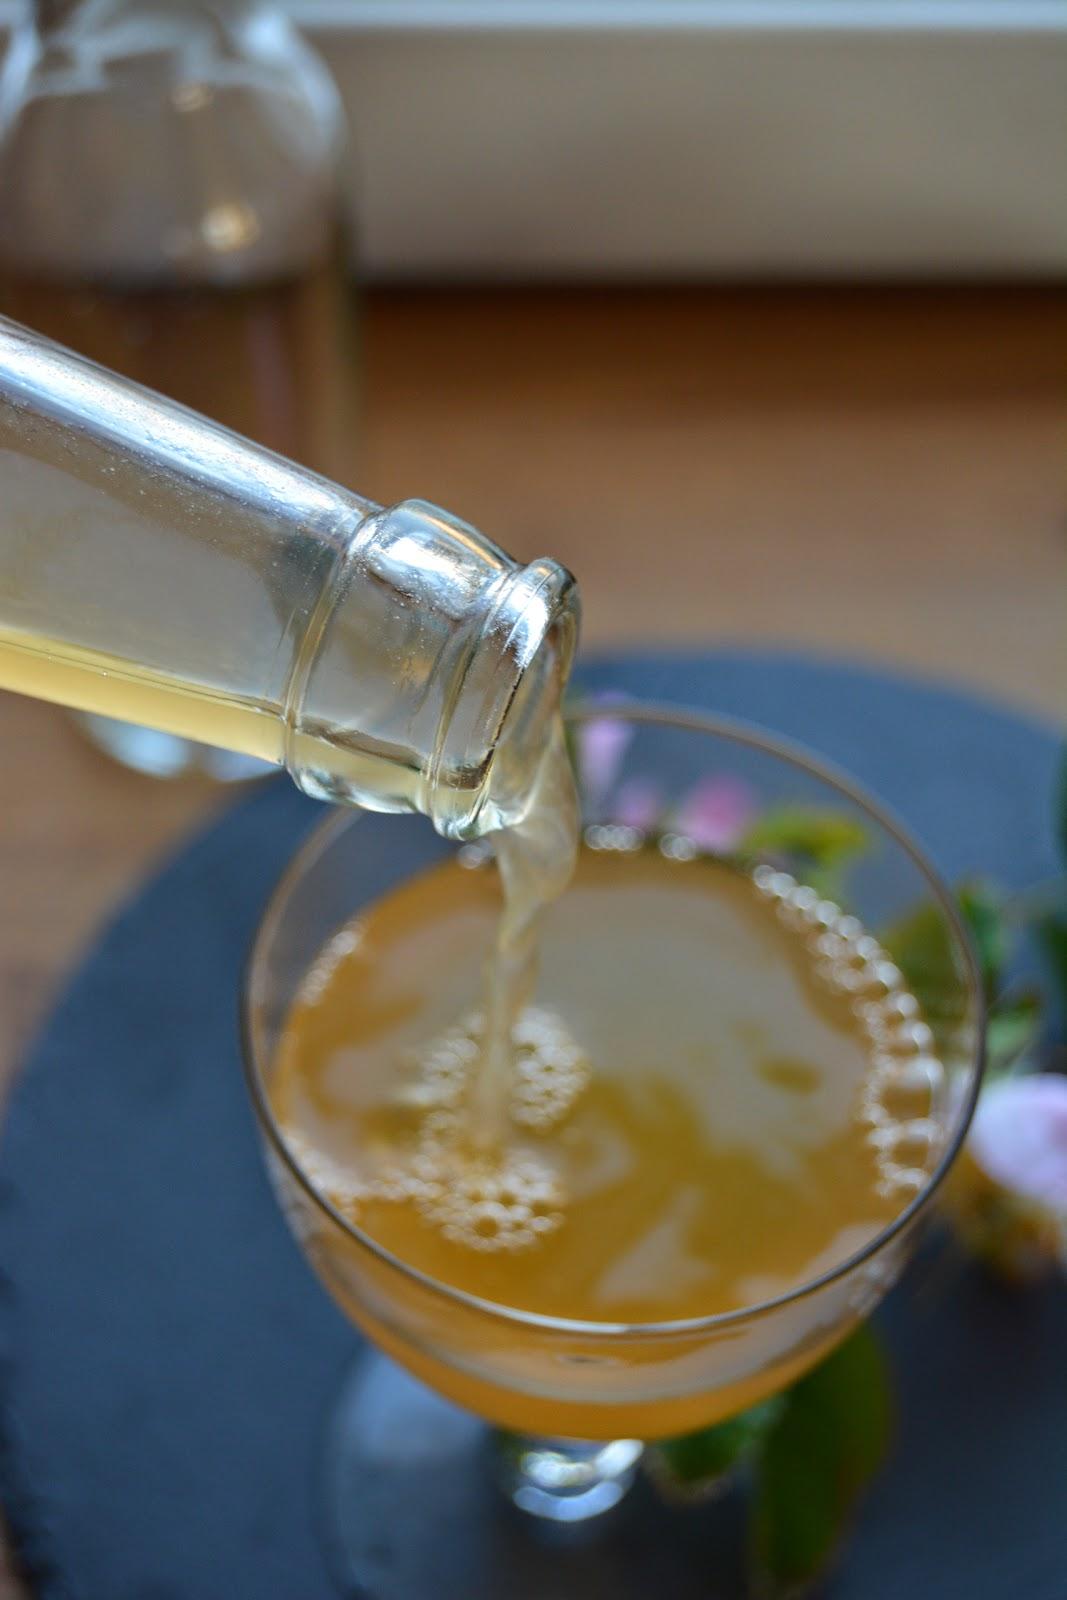 göra äppeljuice hemma